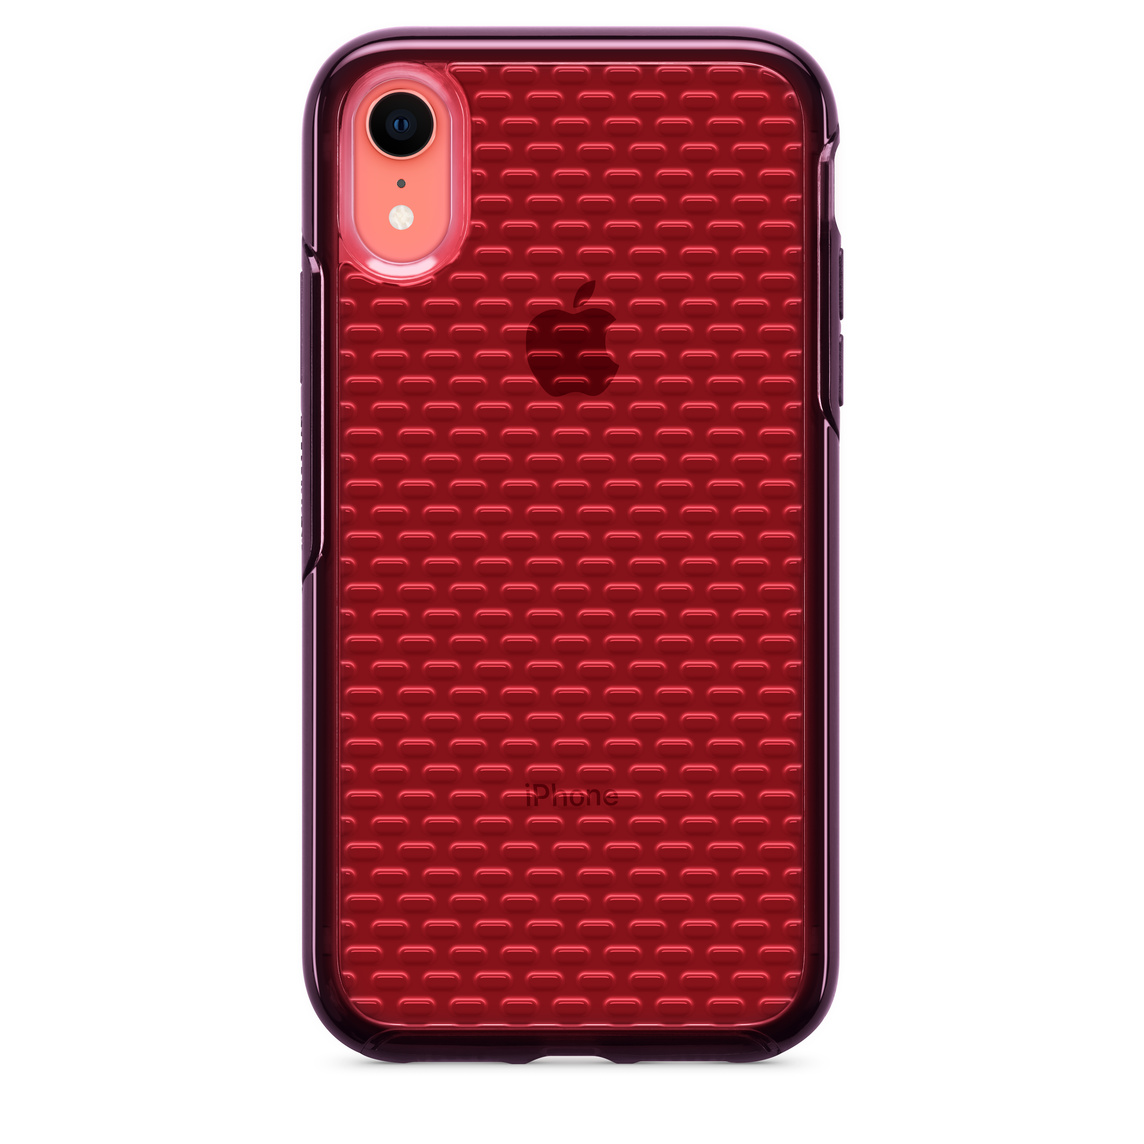 Custodia Evo Rox di Tech21 per iPhone XR - Rosso - Apple (IT)